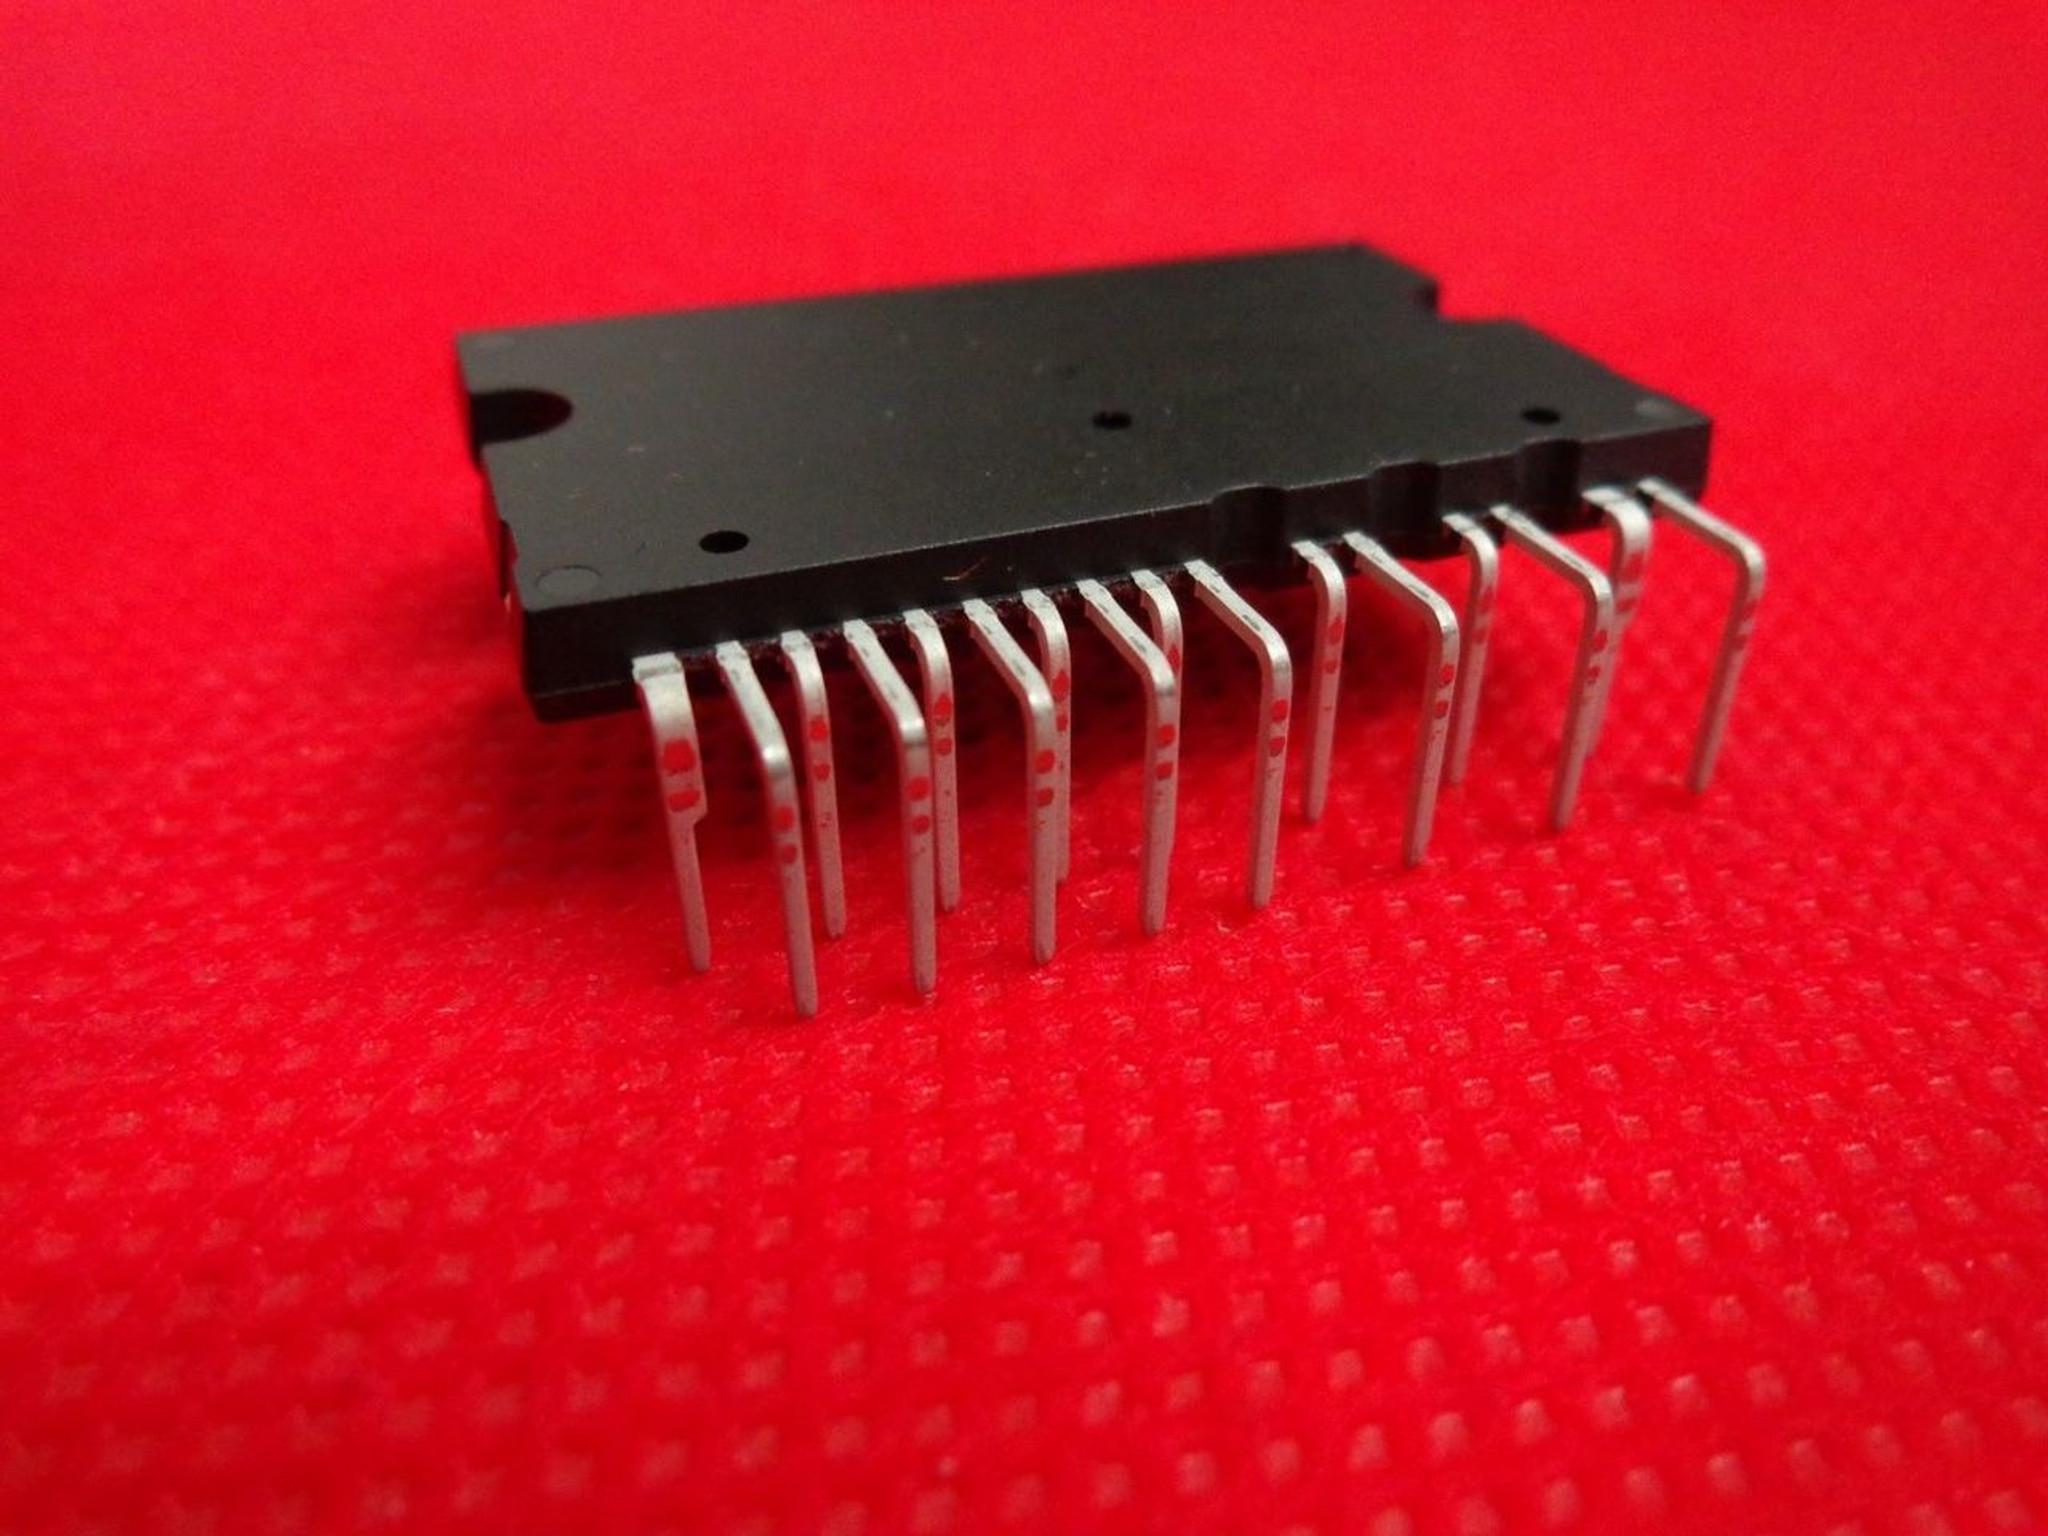 Integrierte Schaltung IKCM15F60GA 15A600V Leistungsmodul Power System